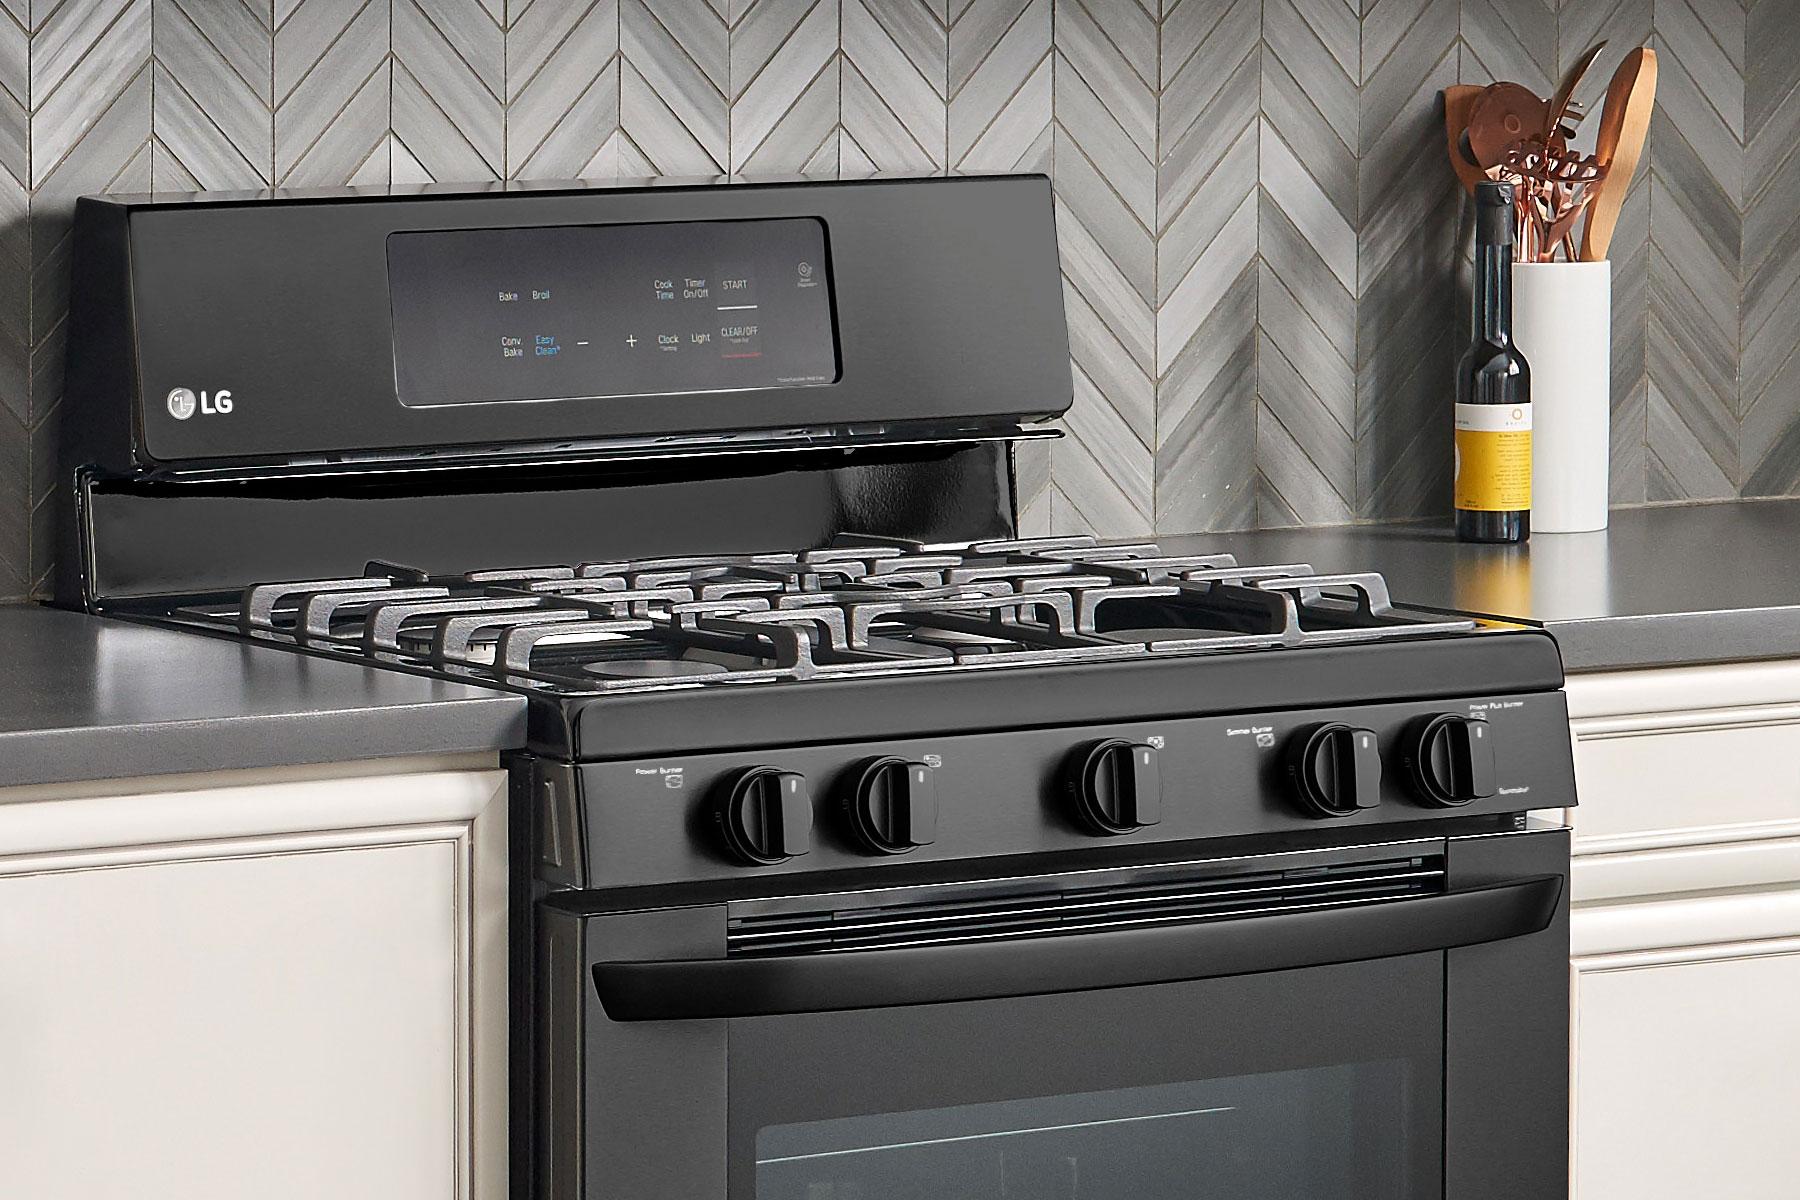 LG Matte Black Oven